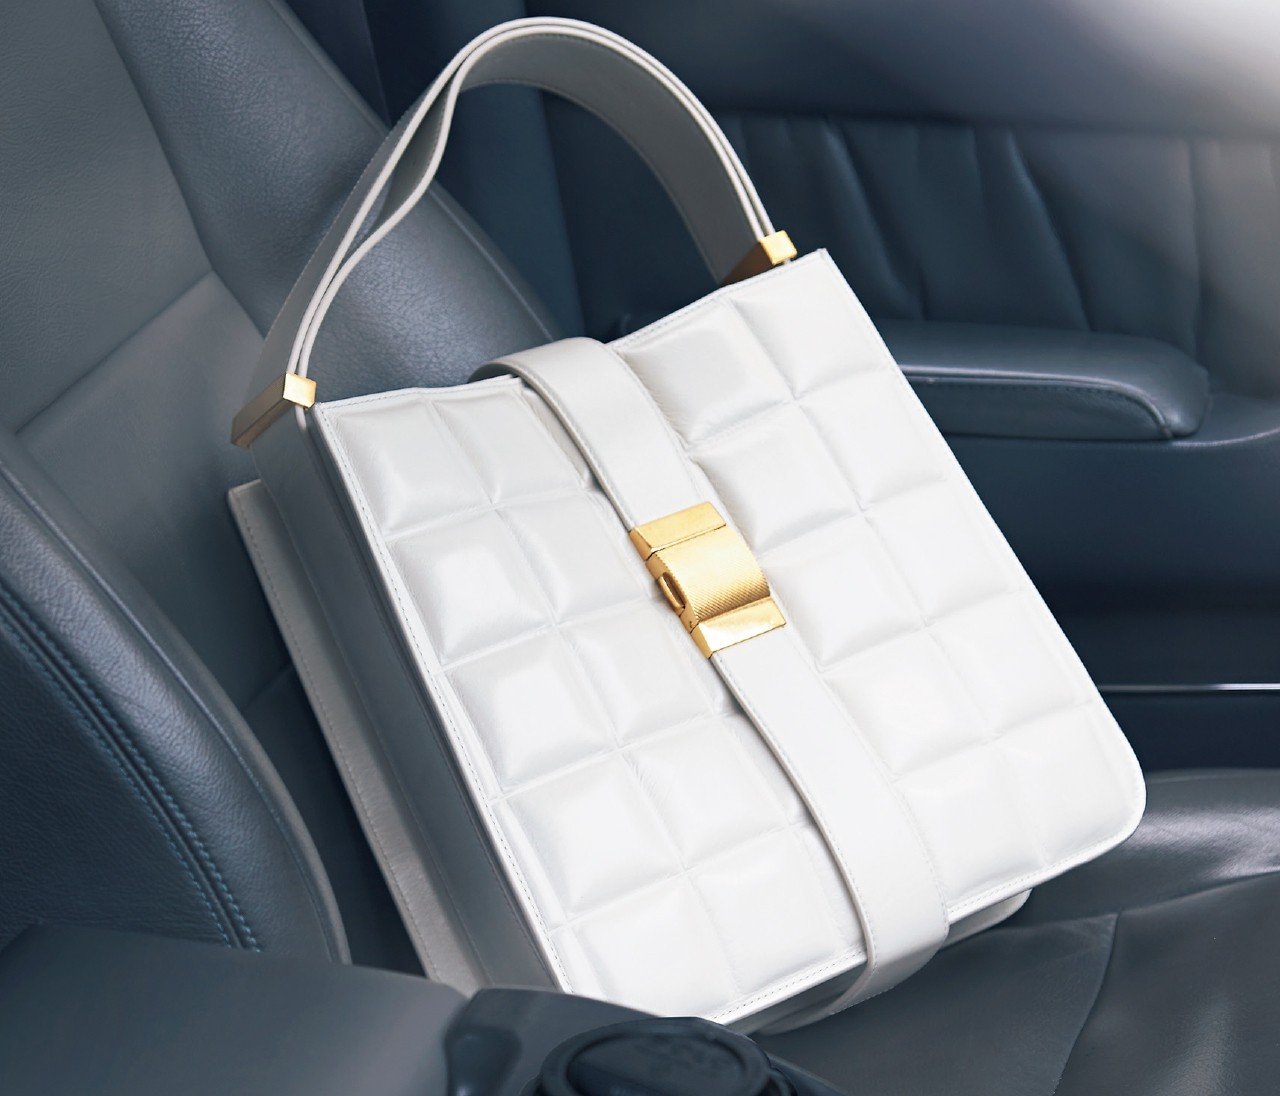 【BOTTEGA VENETA(ボッテガ・ヴェネタ)】秋に映えるホワイトレザーの新作バッグ